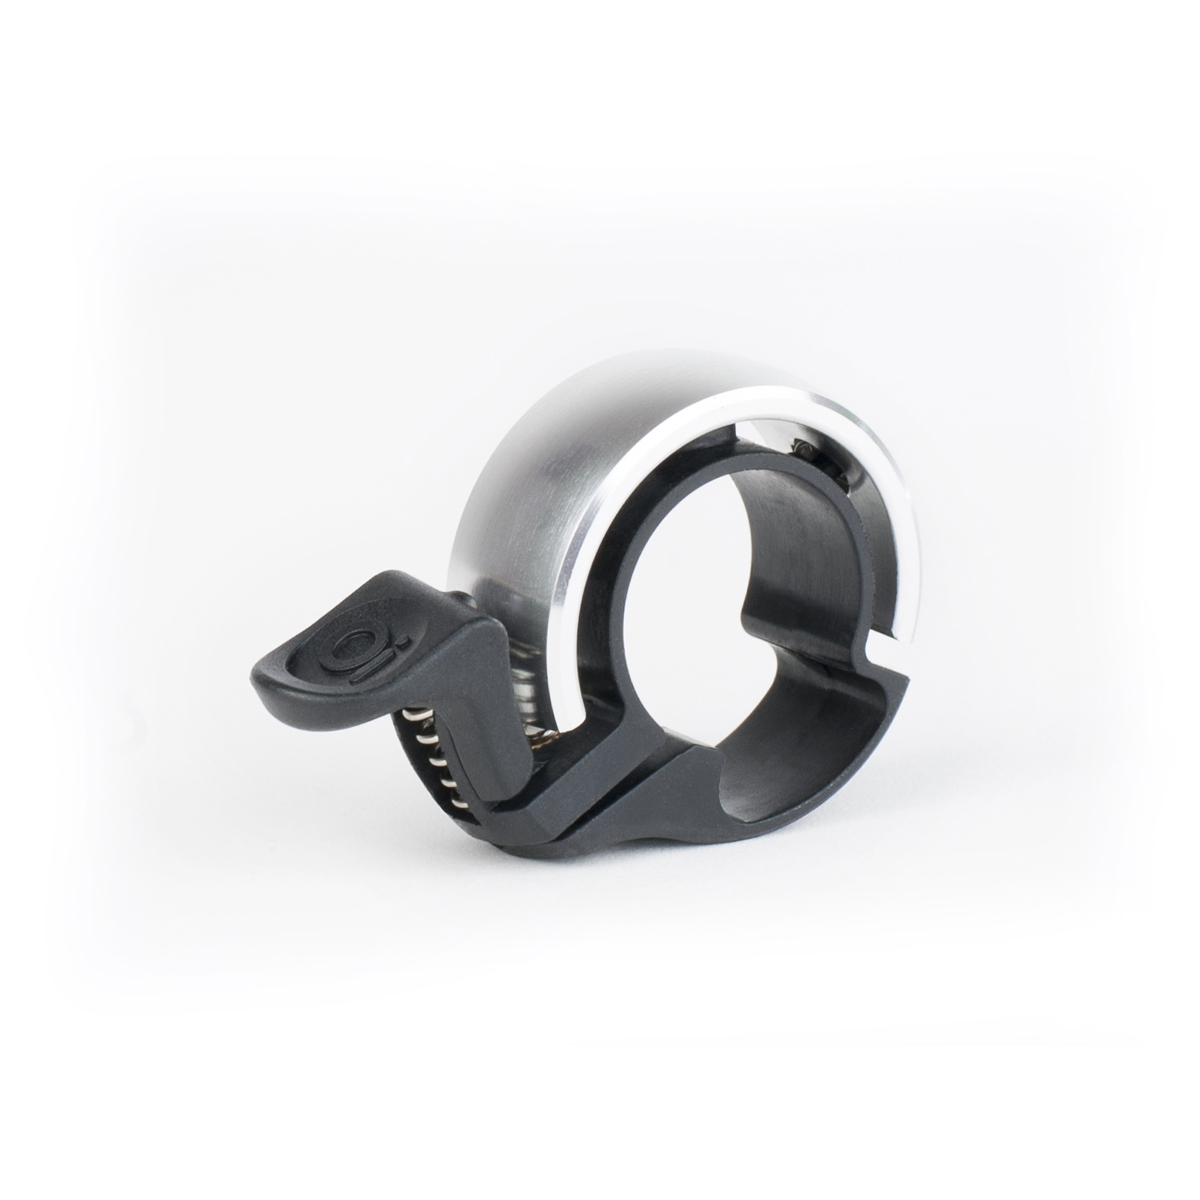 Ringklokke Knog Oi Classic Small ø22 - sølv - KN11977 | Bells